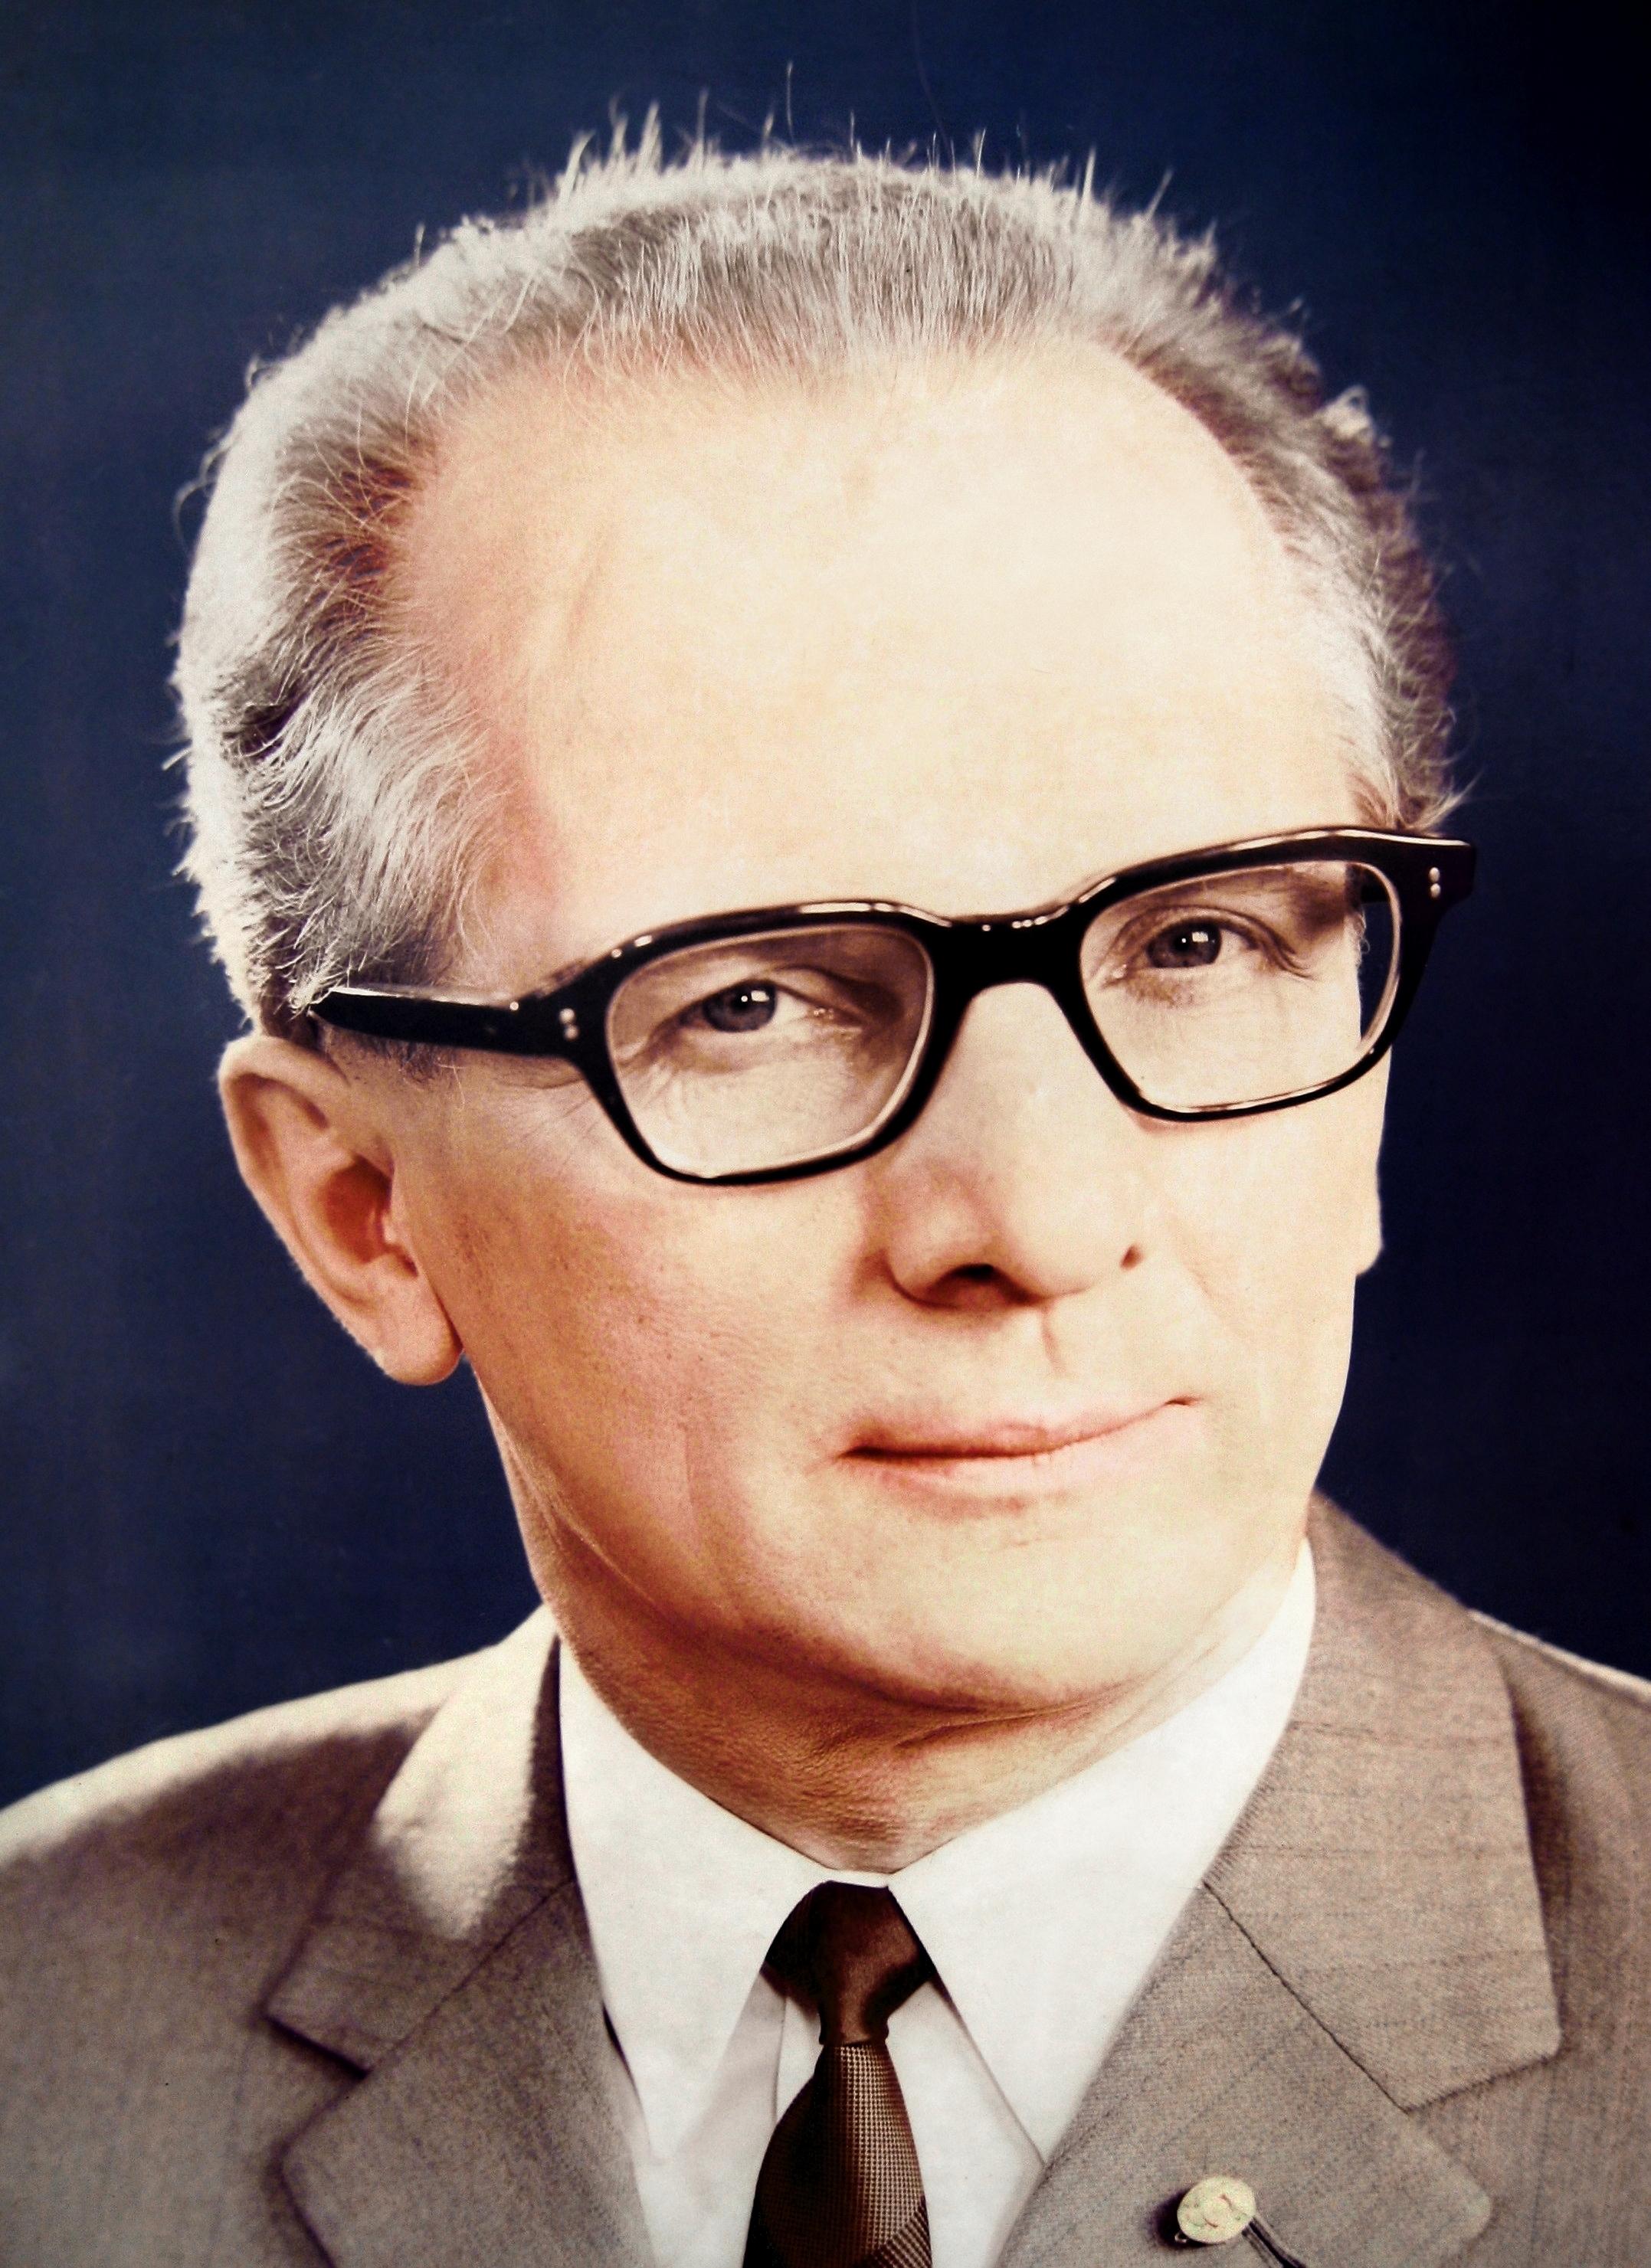 Bilder Erich Honecker